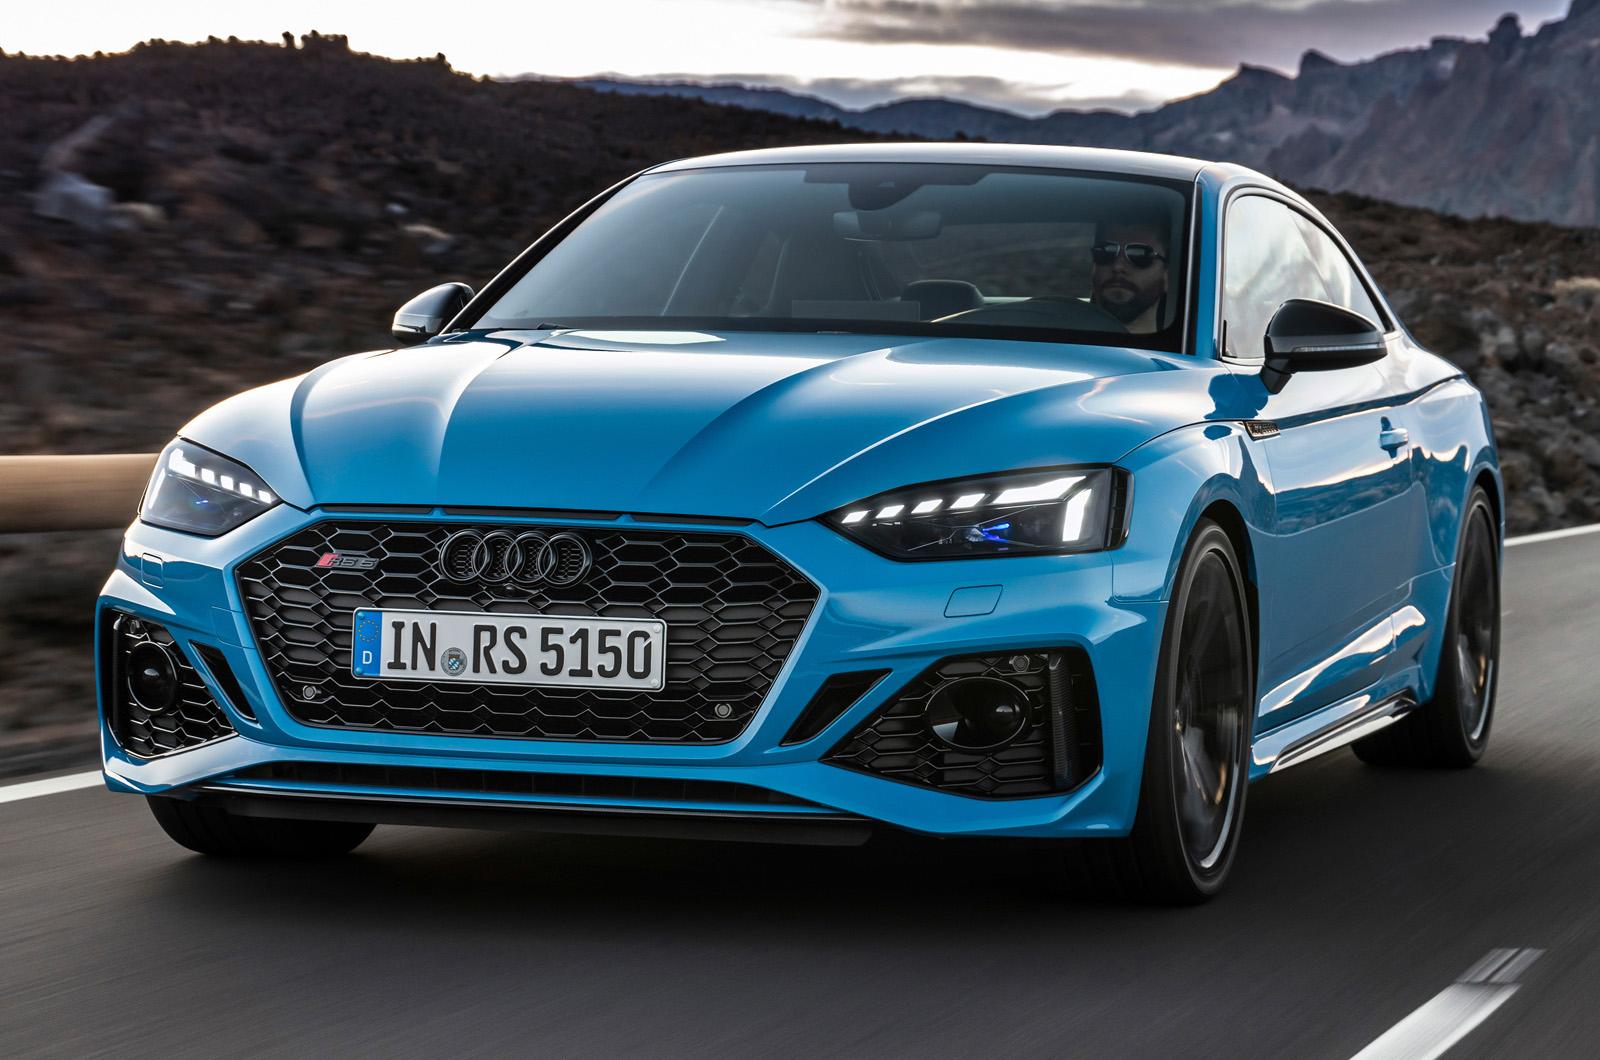 Kelebihan Audi R5 Tangguh